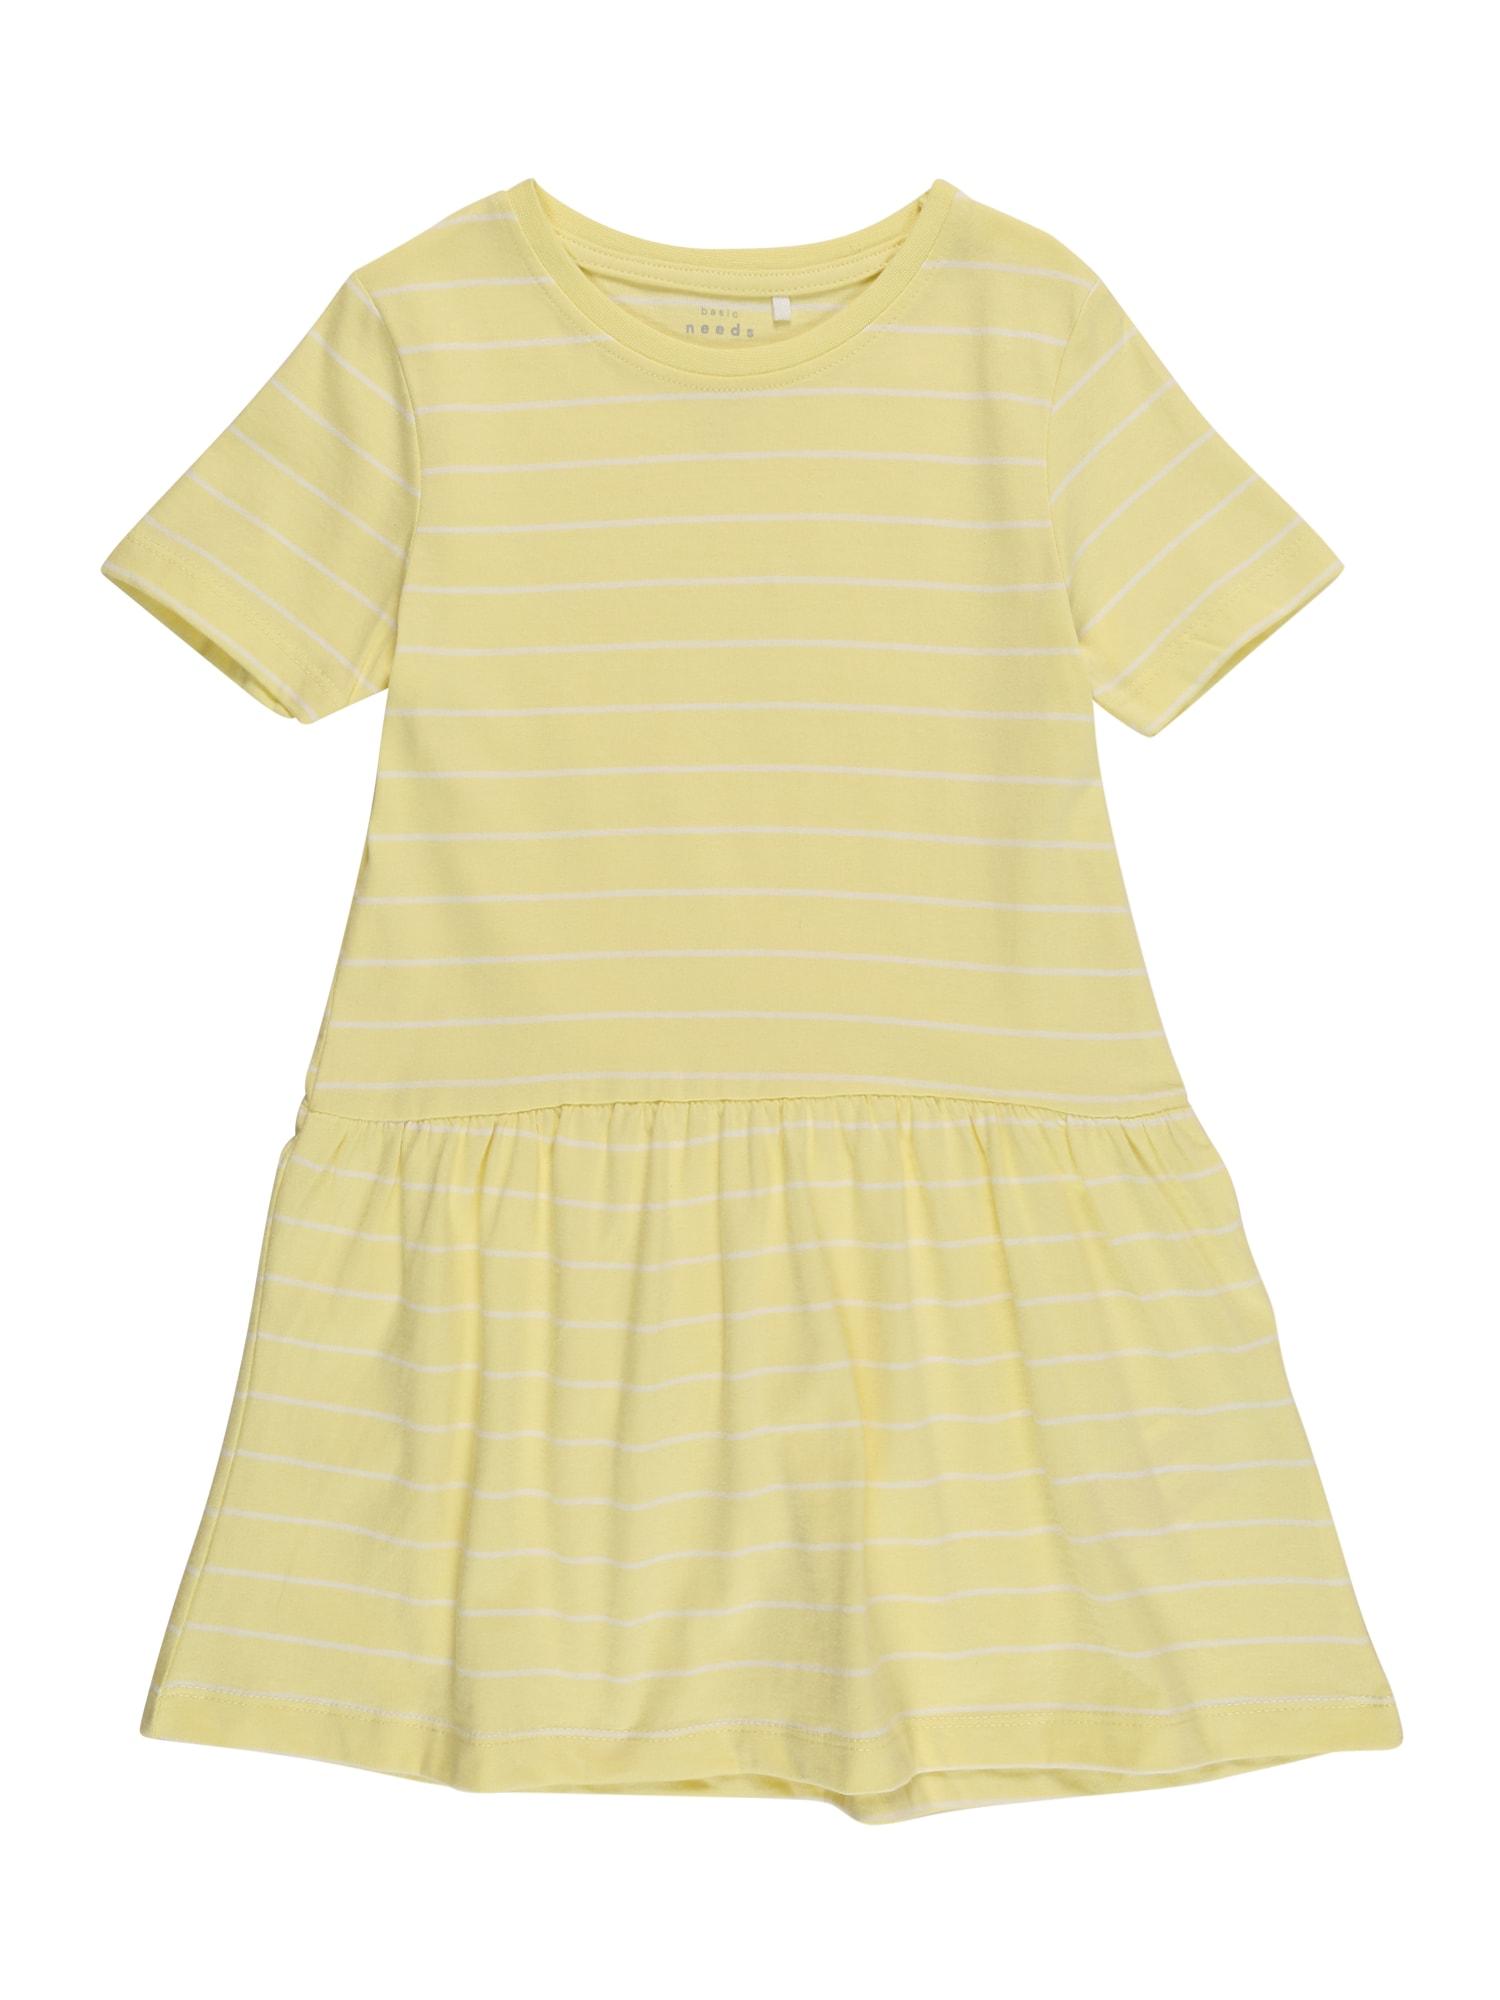 NAME IT Suknelė 'VAMAJA' geltona / balta